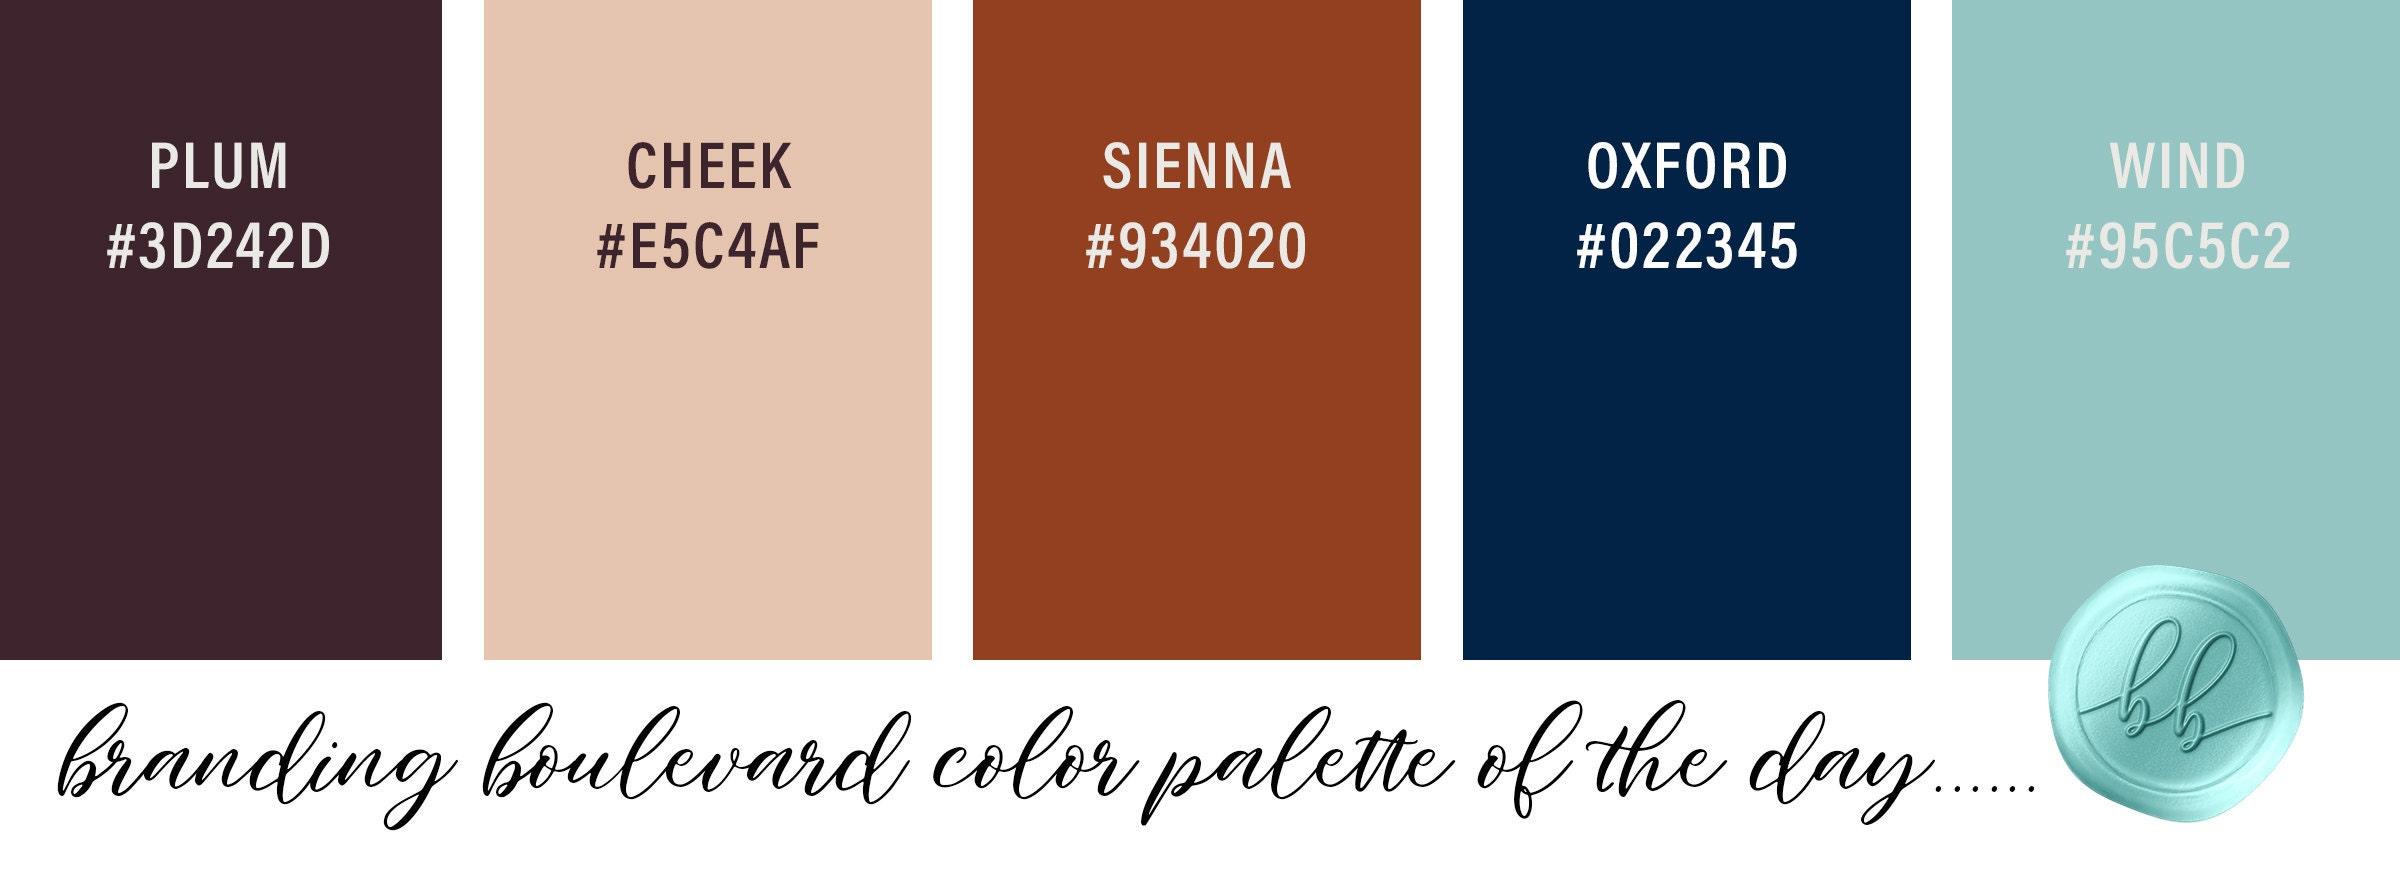 A Hint of Autumn Color Palette - Color Palette of the Day - Plum (Deep Purple), Cheek (Skin-tone Peach), Burnt Sienna (Rust Terracotta Orange), Oxford (Navy Blue), and Wind (Aqua)